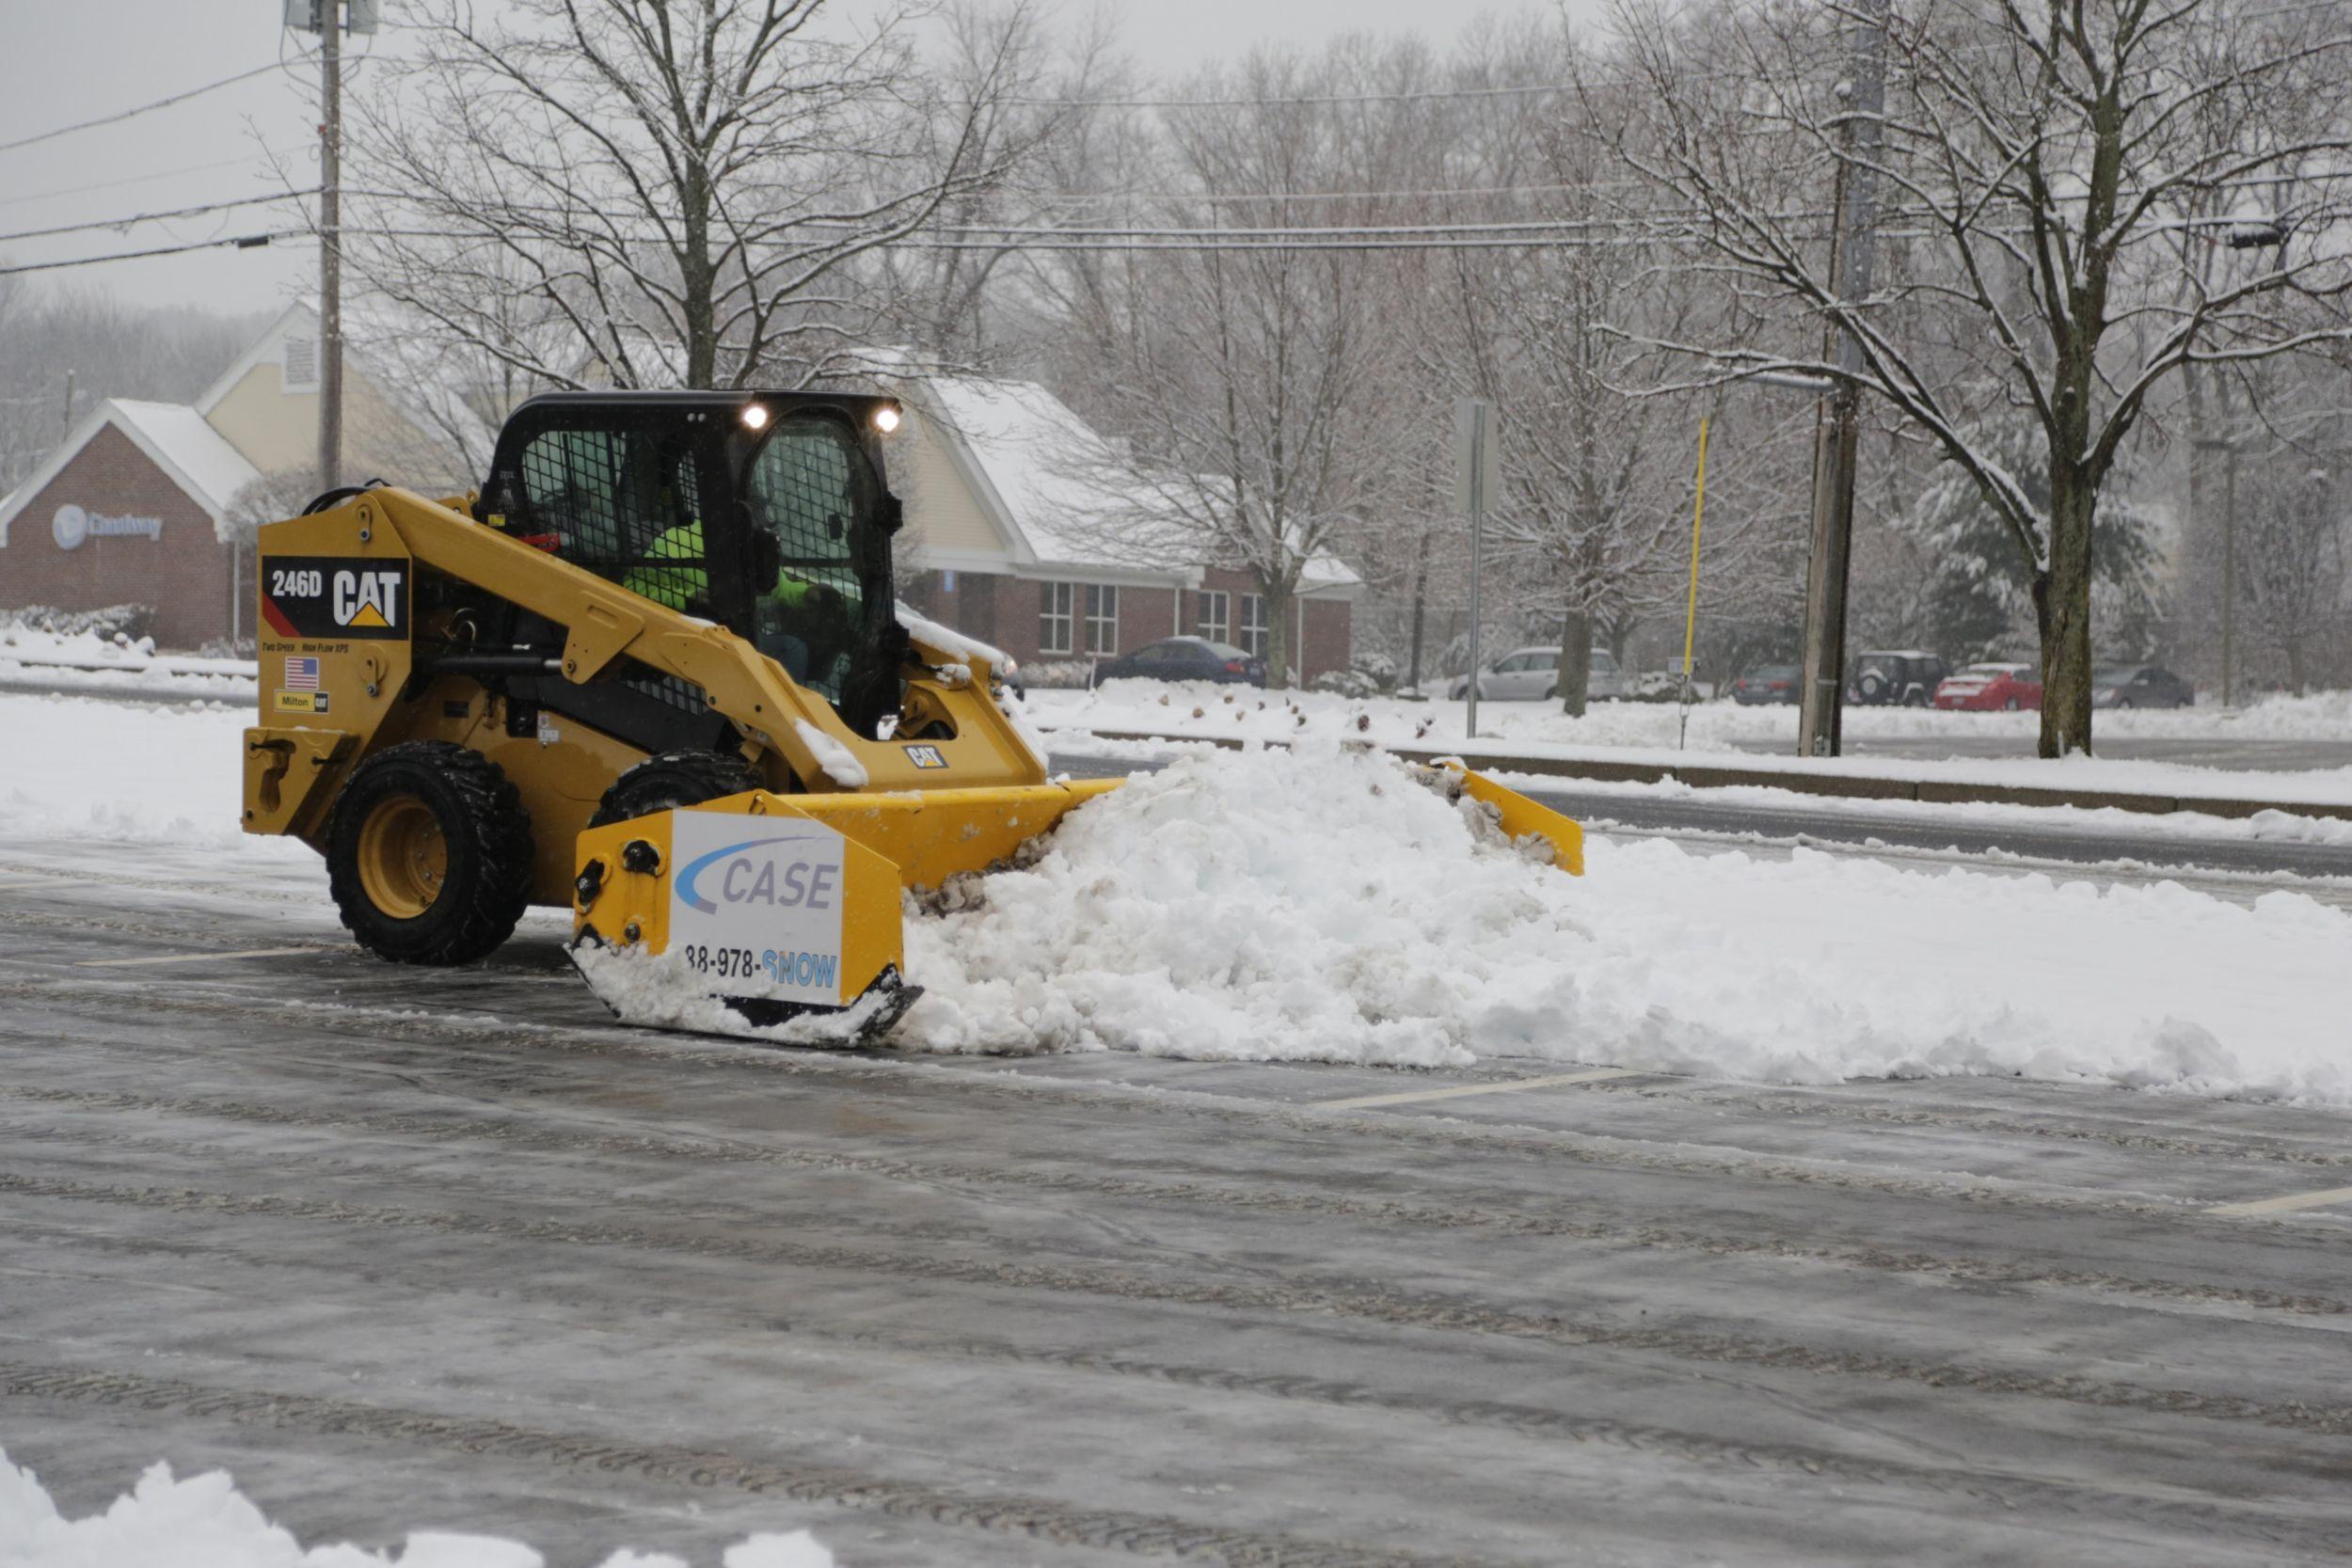 Cat® Machines Help Case Snow Management Tackle Winter Weather